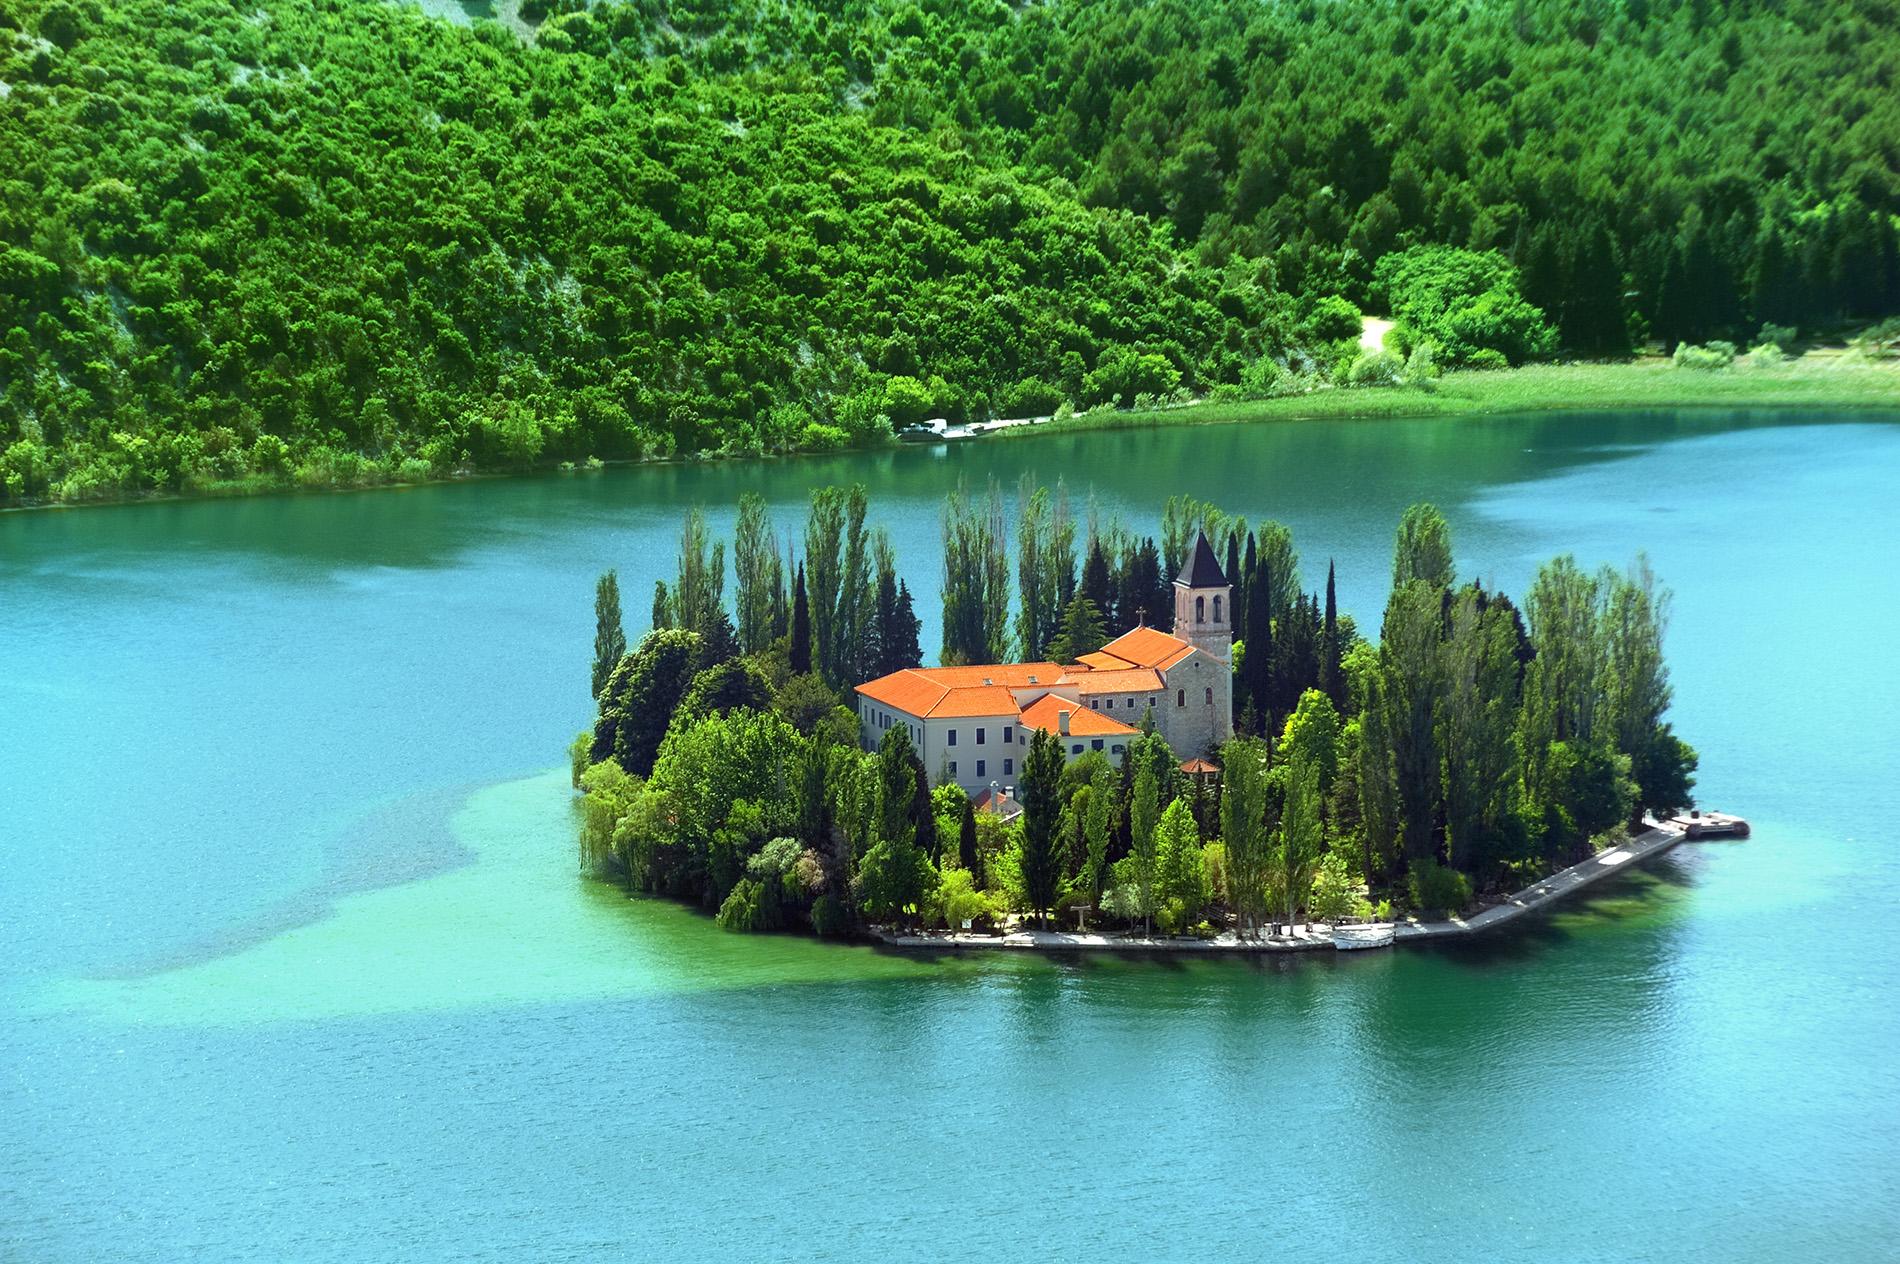 visovac-island-with-the-franciscan-monaste-secret-world